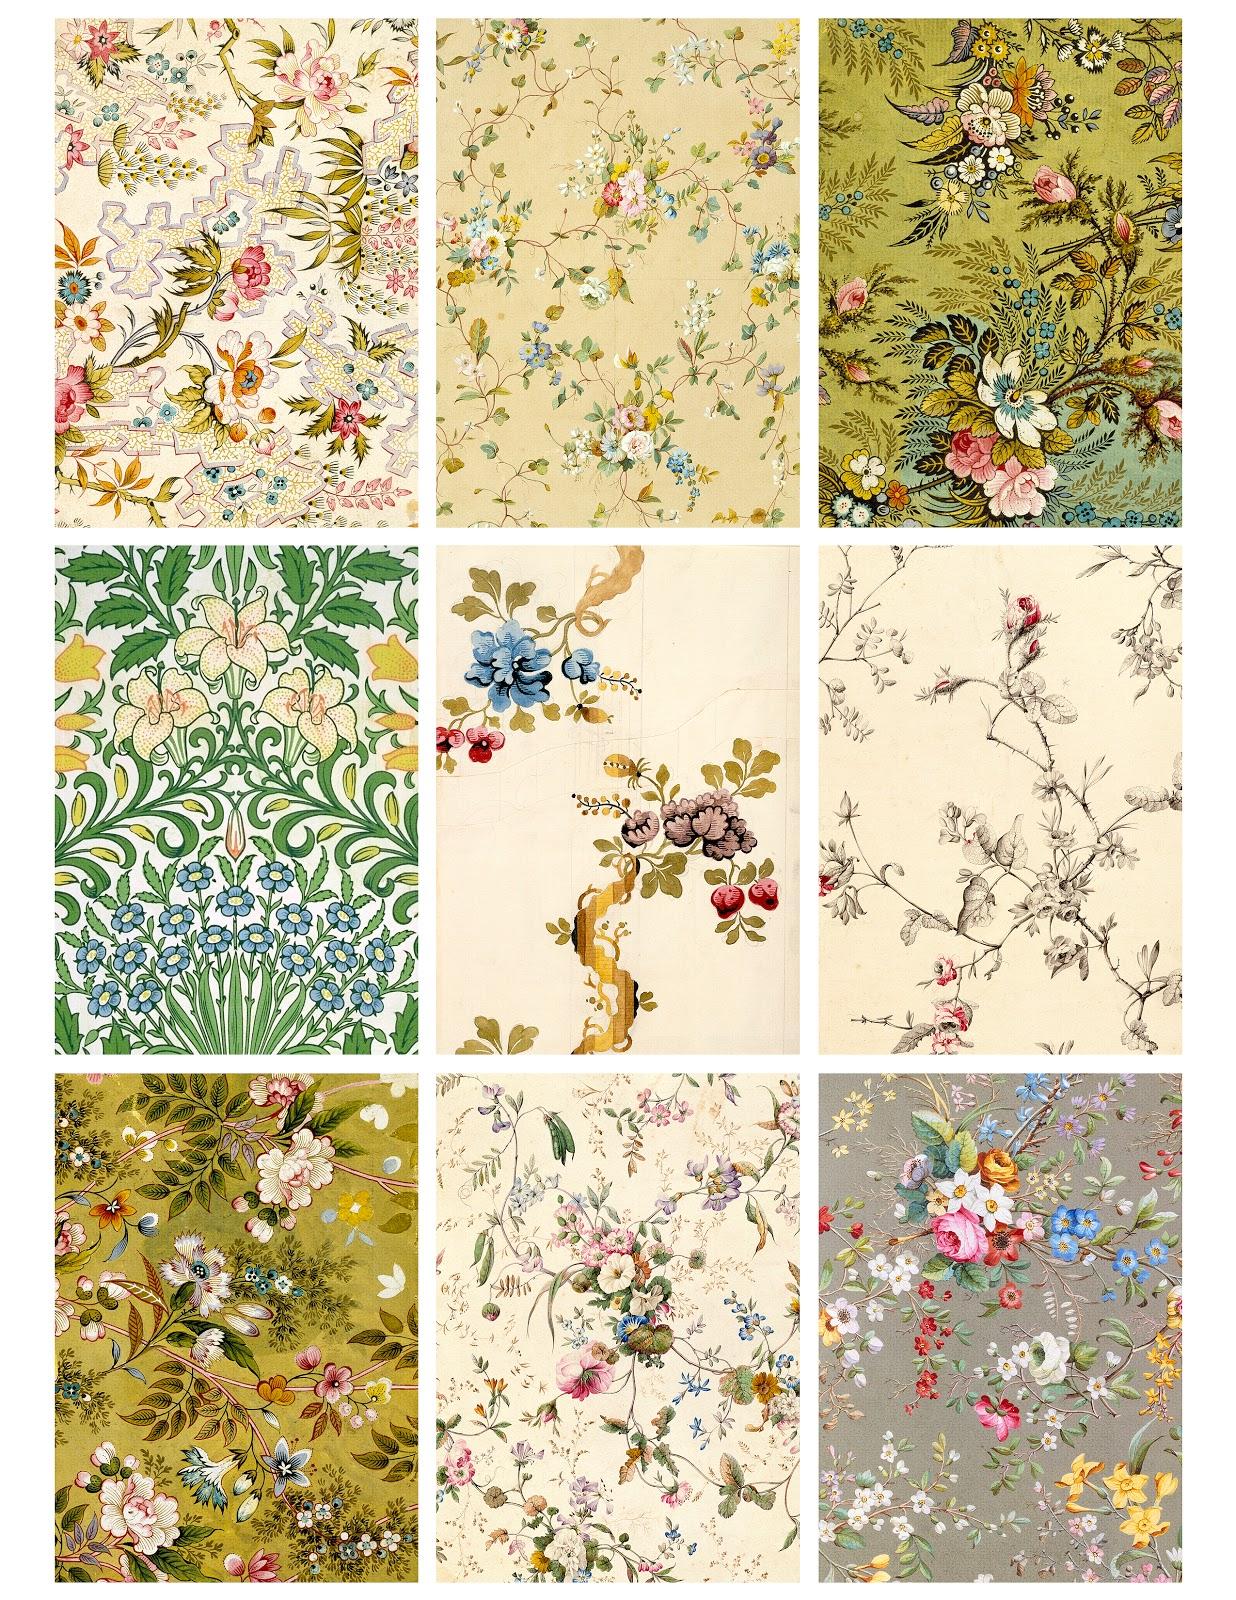 Jodie Lee Designs Printable Antique Flower Wallpaper Cards 1236x1600